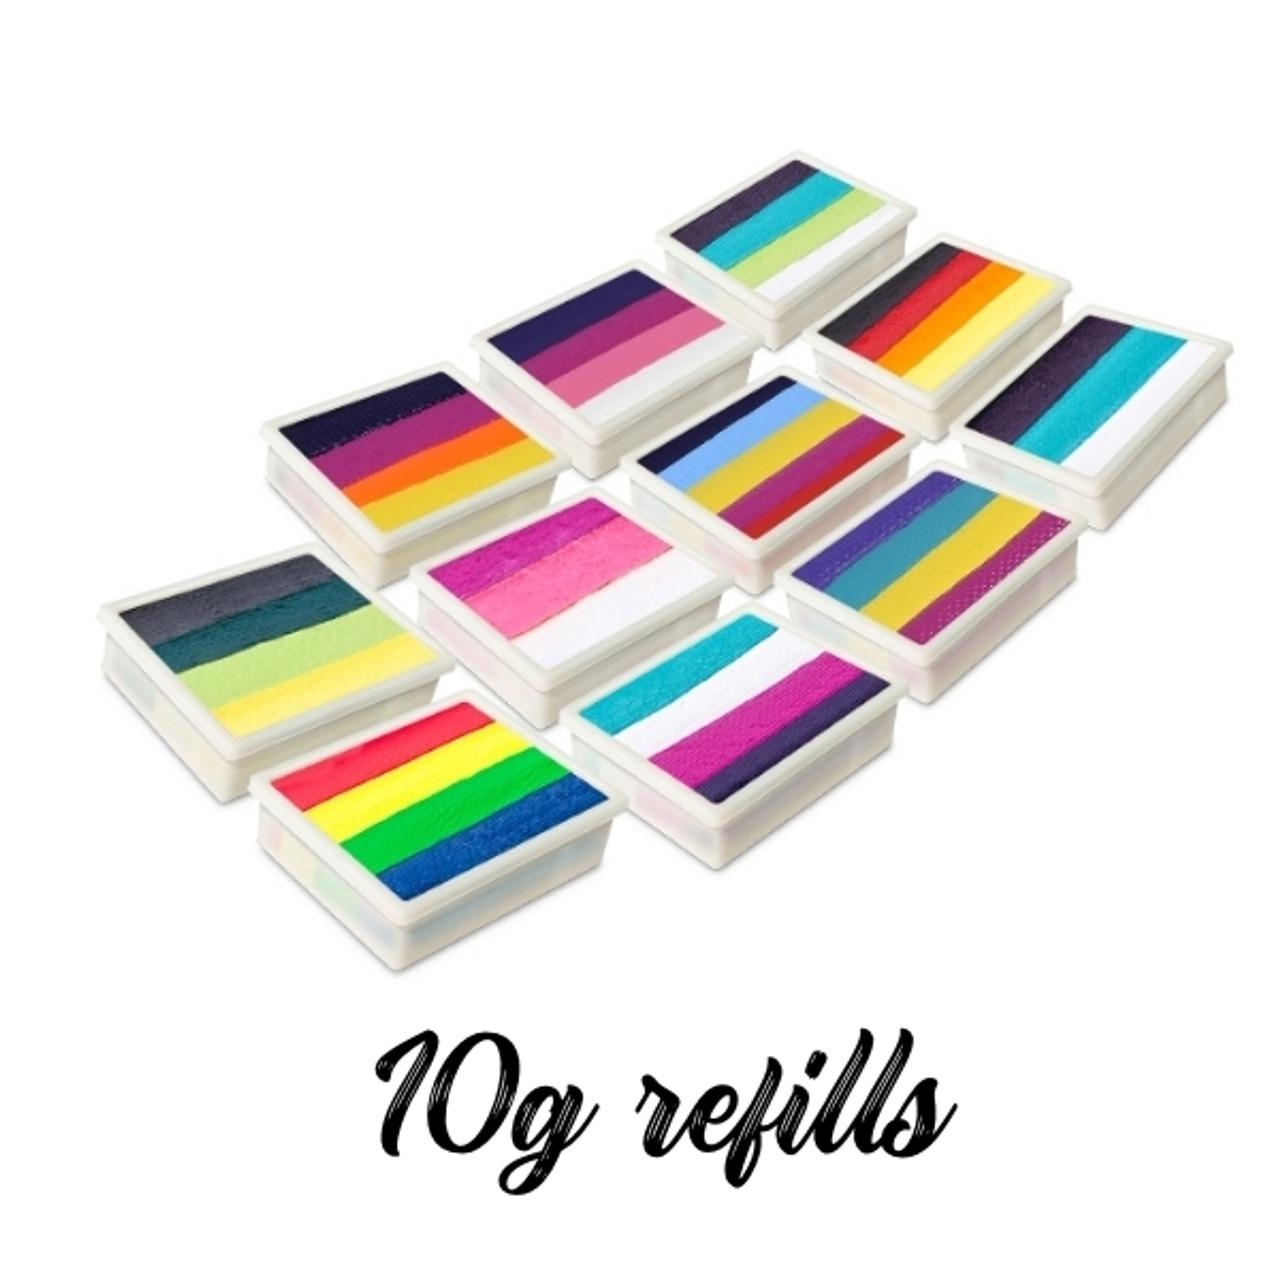 10g Refills